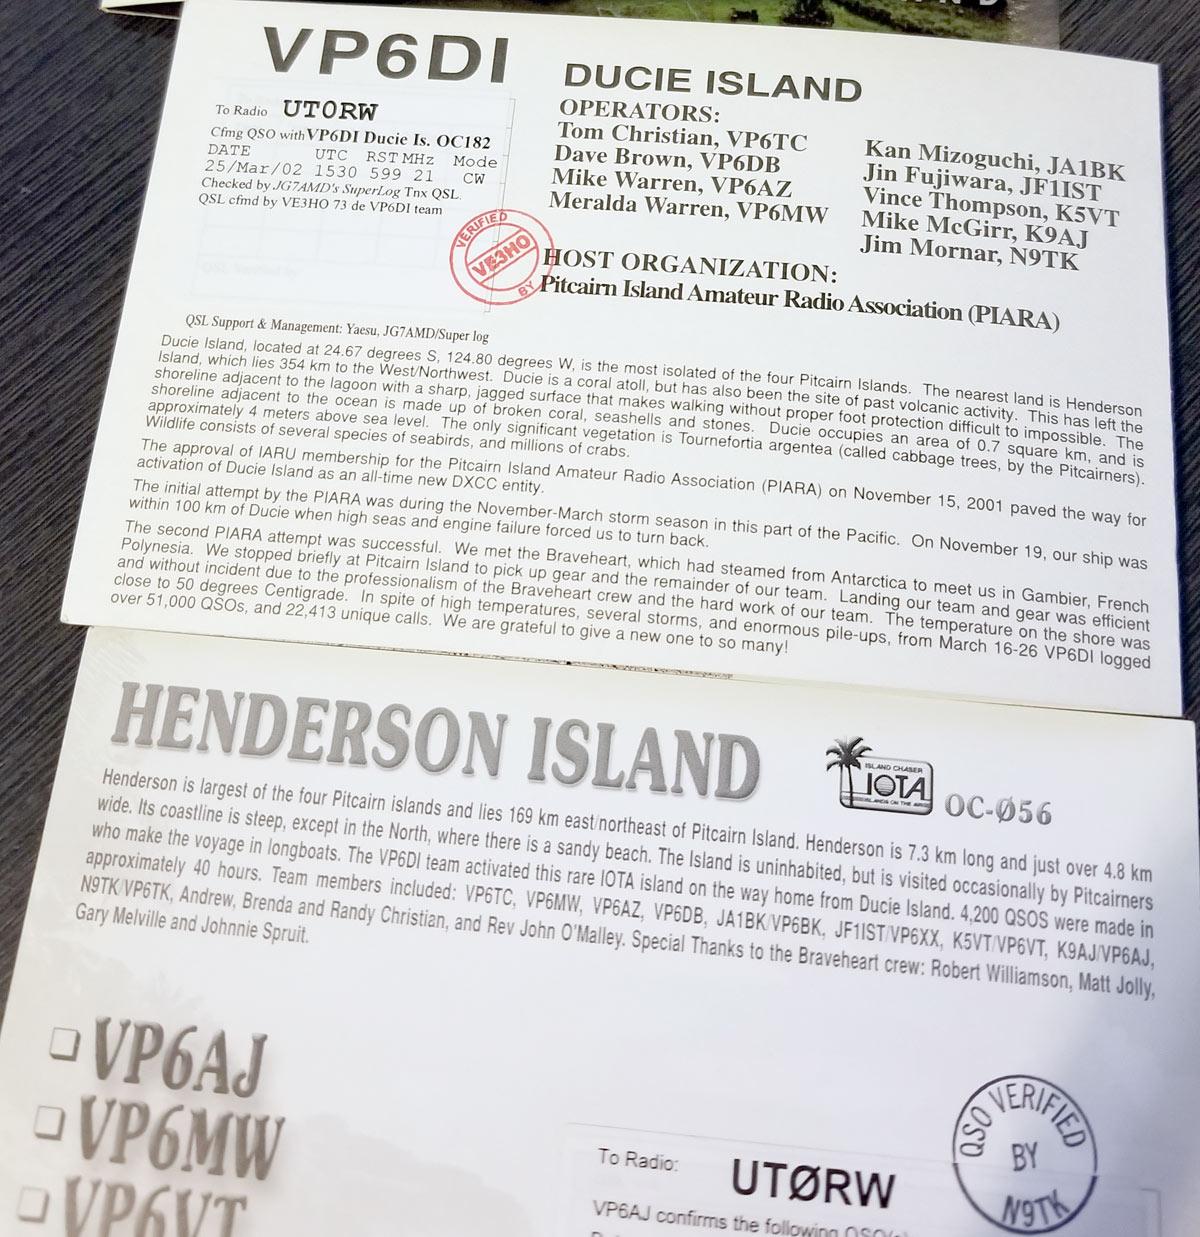 VP6 land